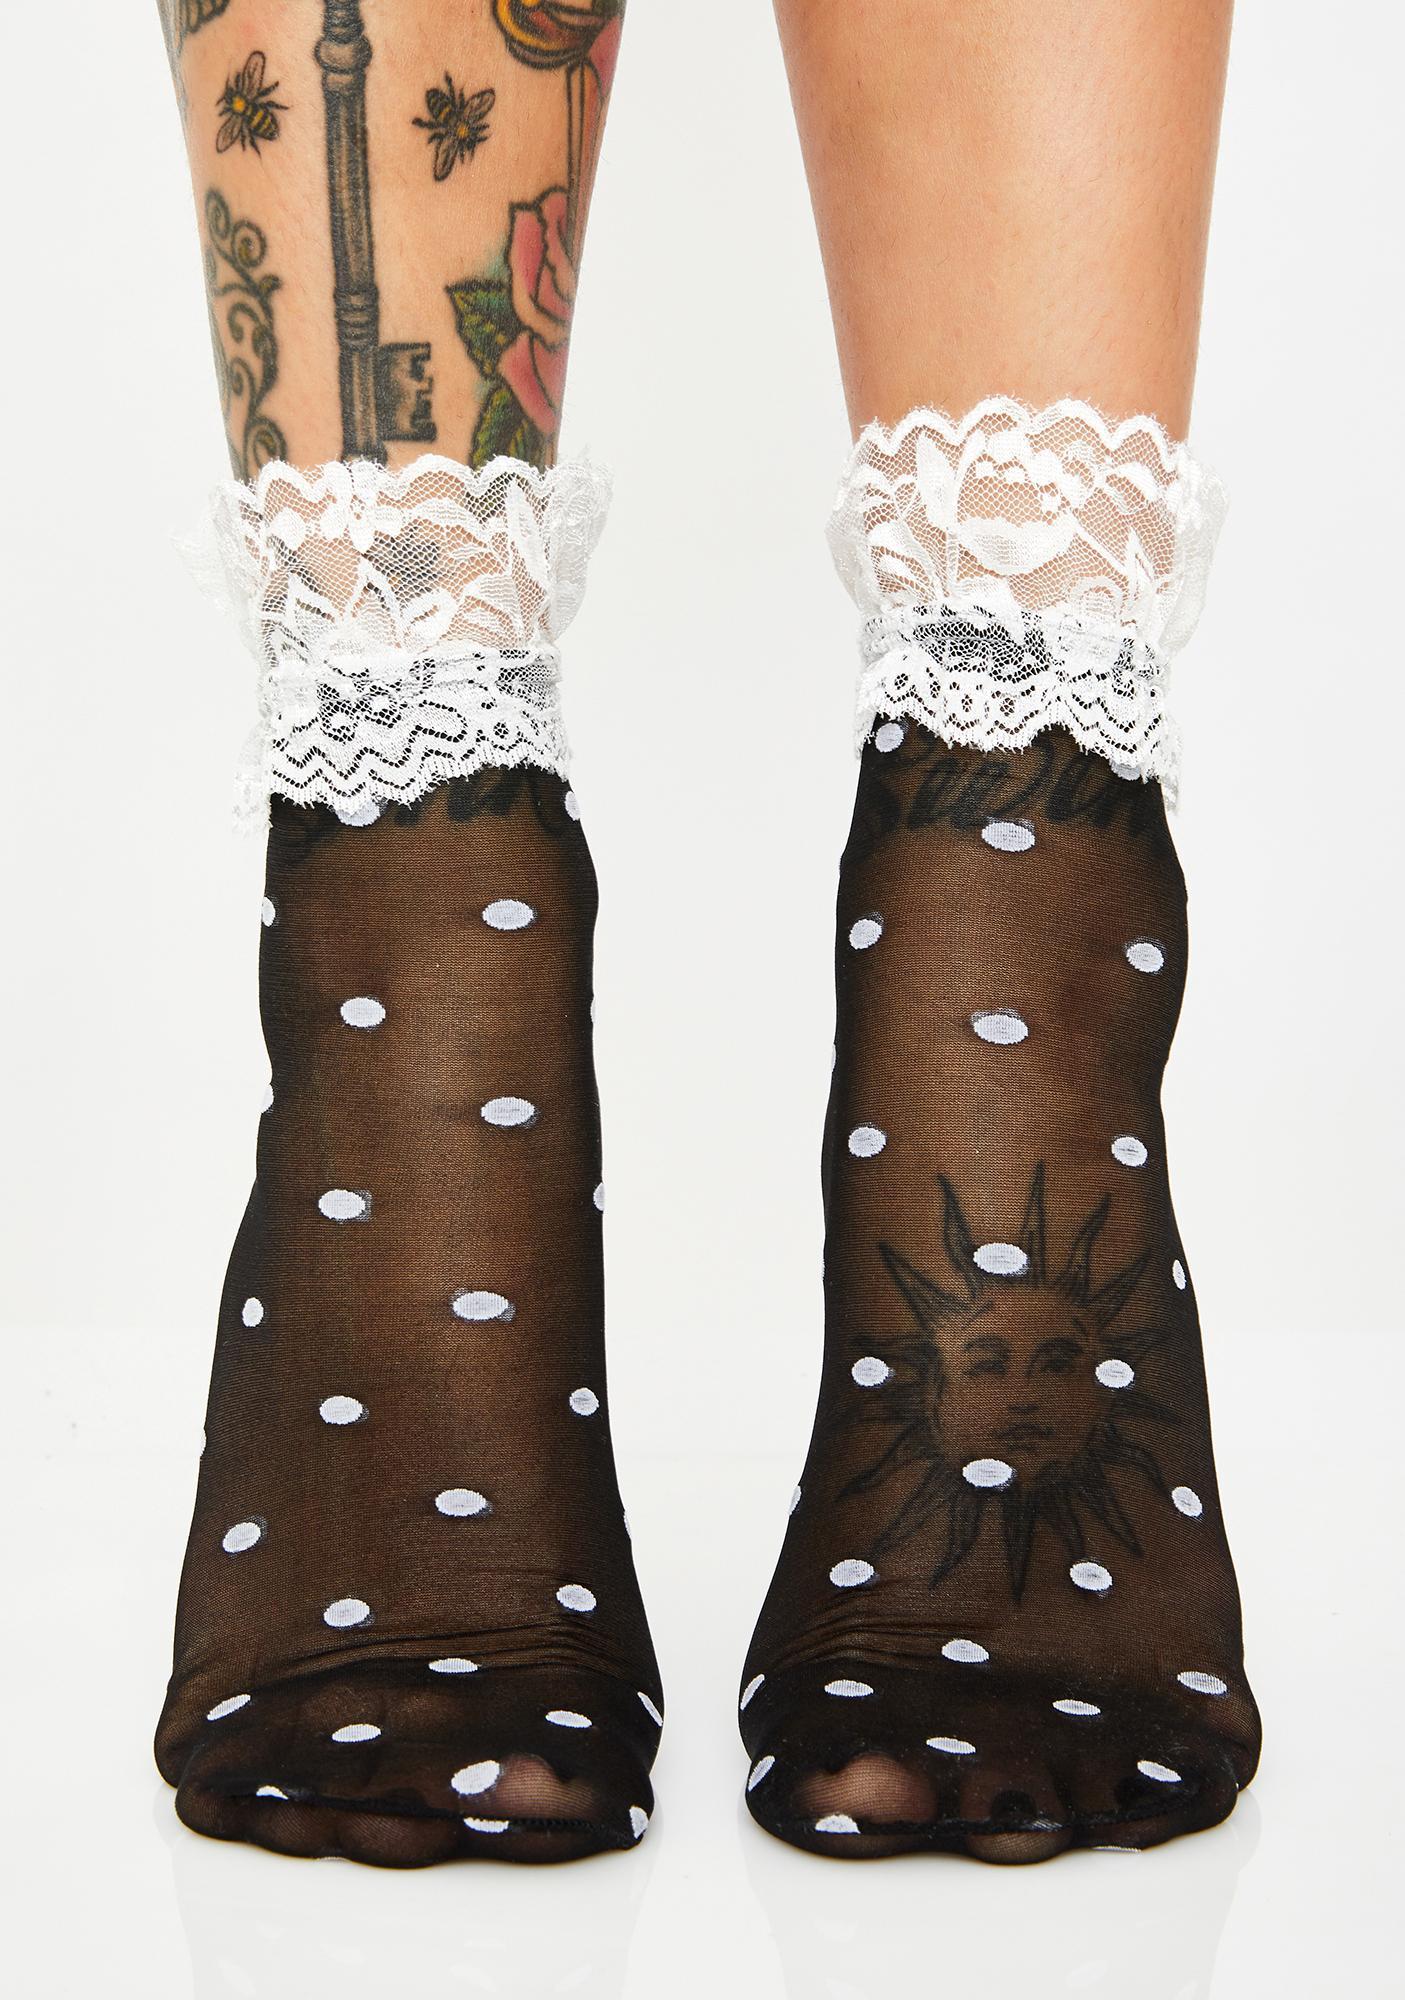 Angel Pampered Life Sheer Socks